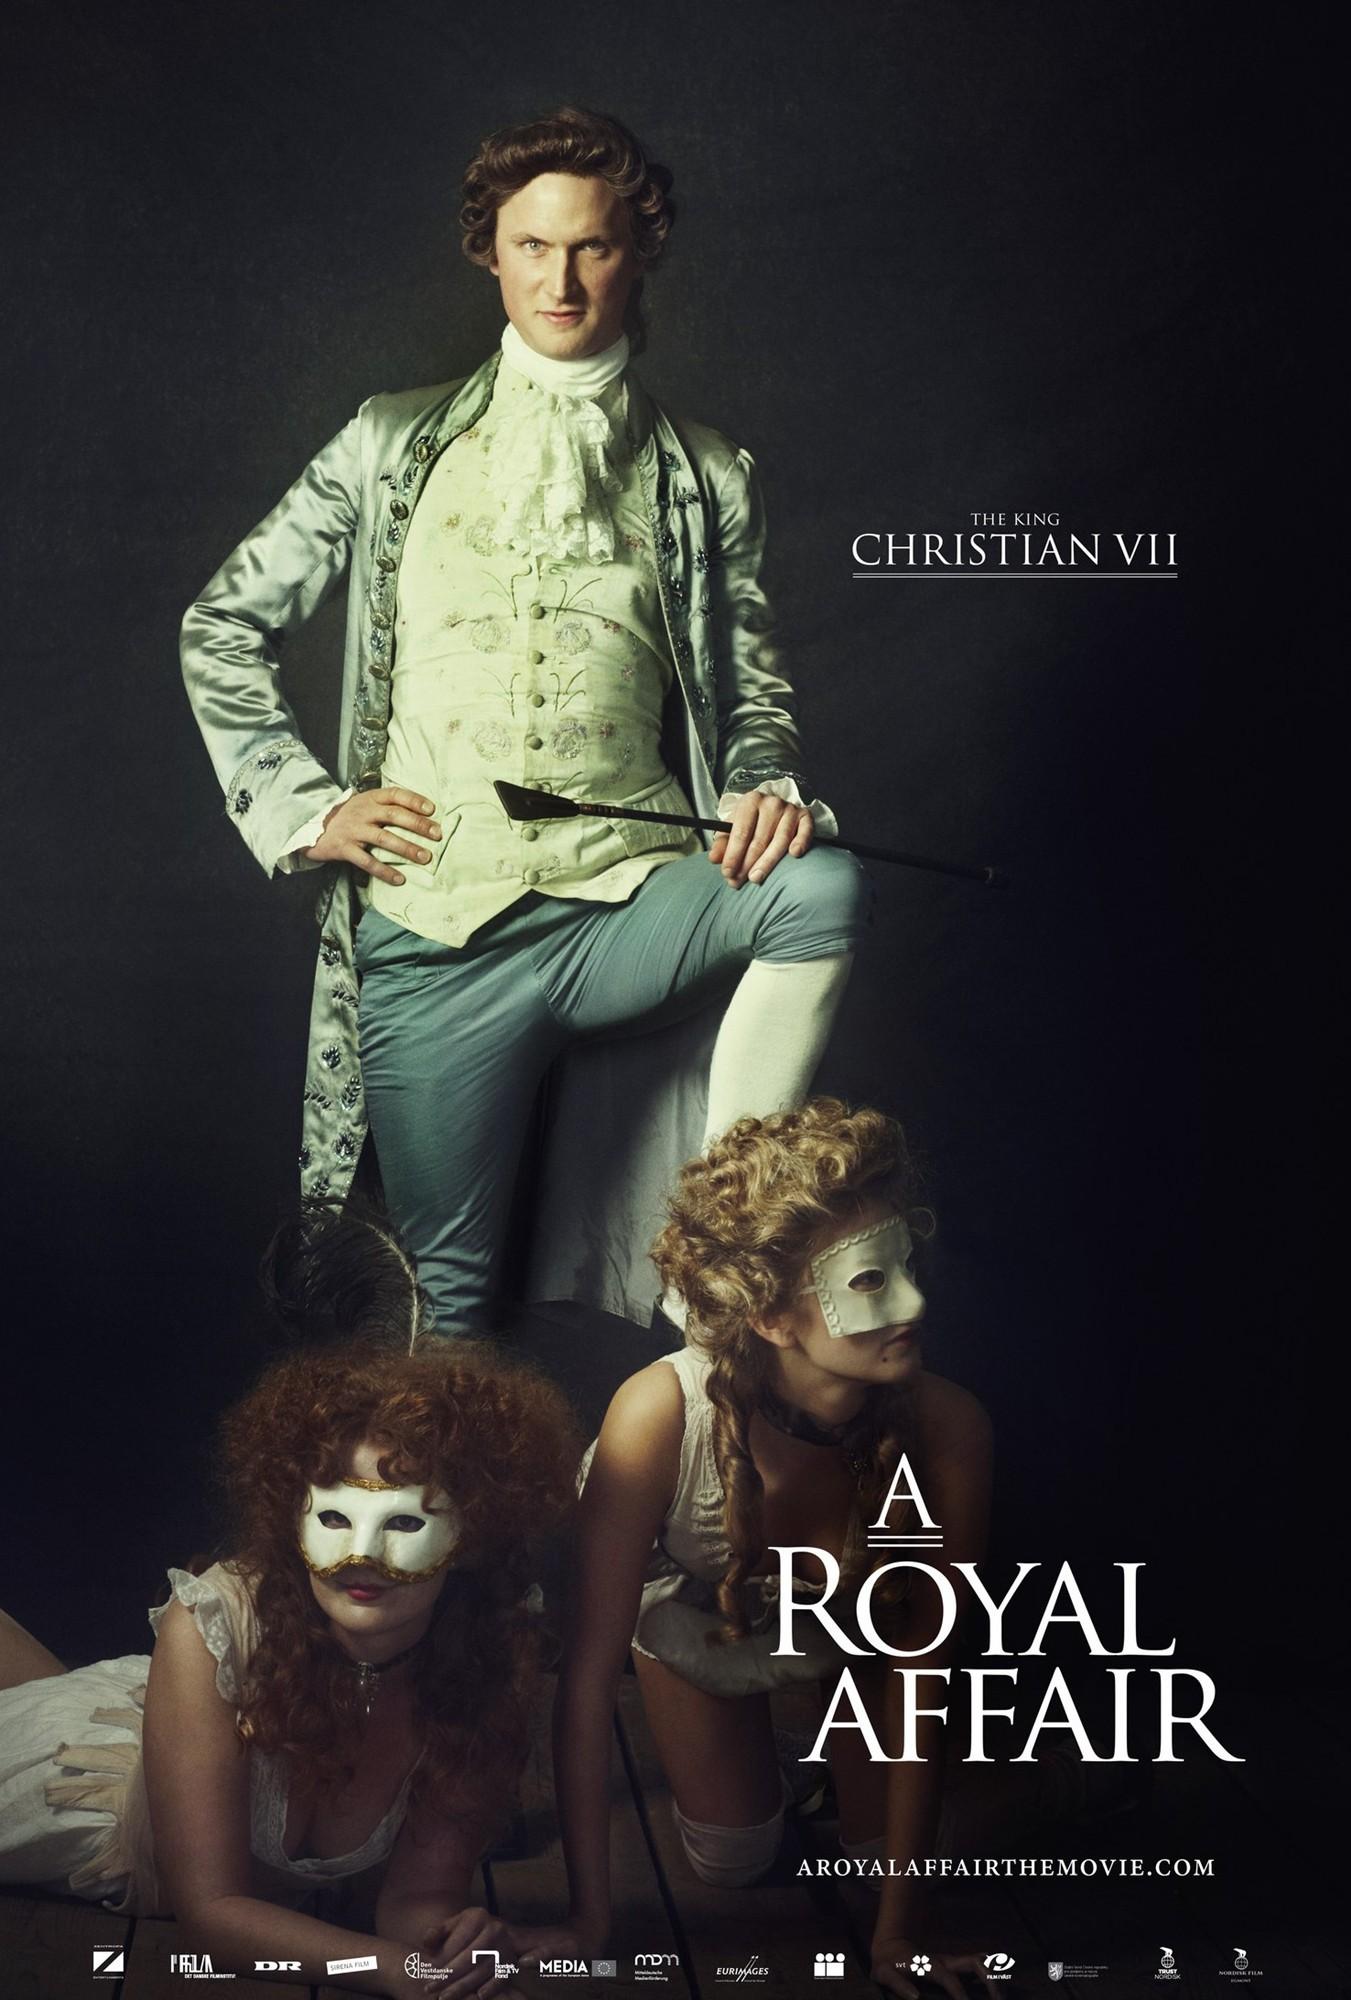 A Royal Affair (En kongelig affaere) - cronica de film | Cronici Filme